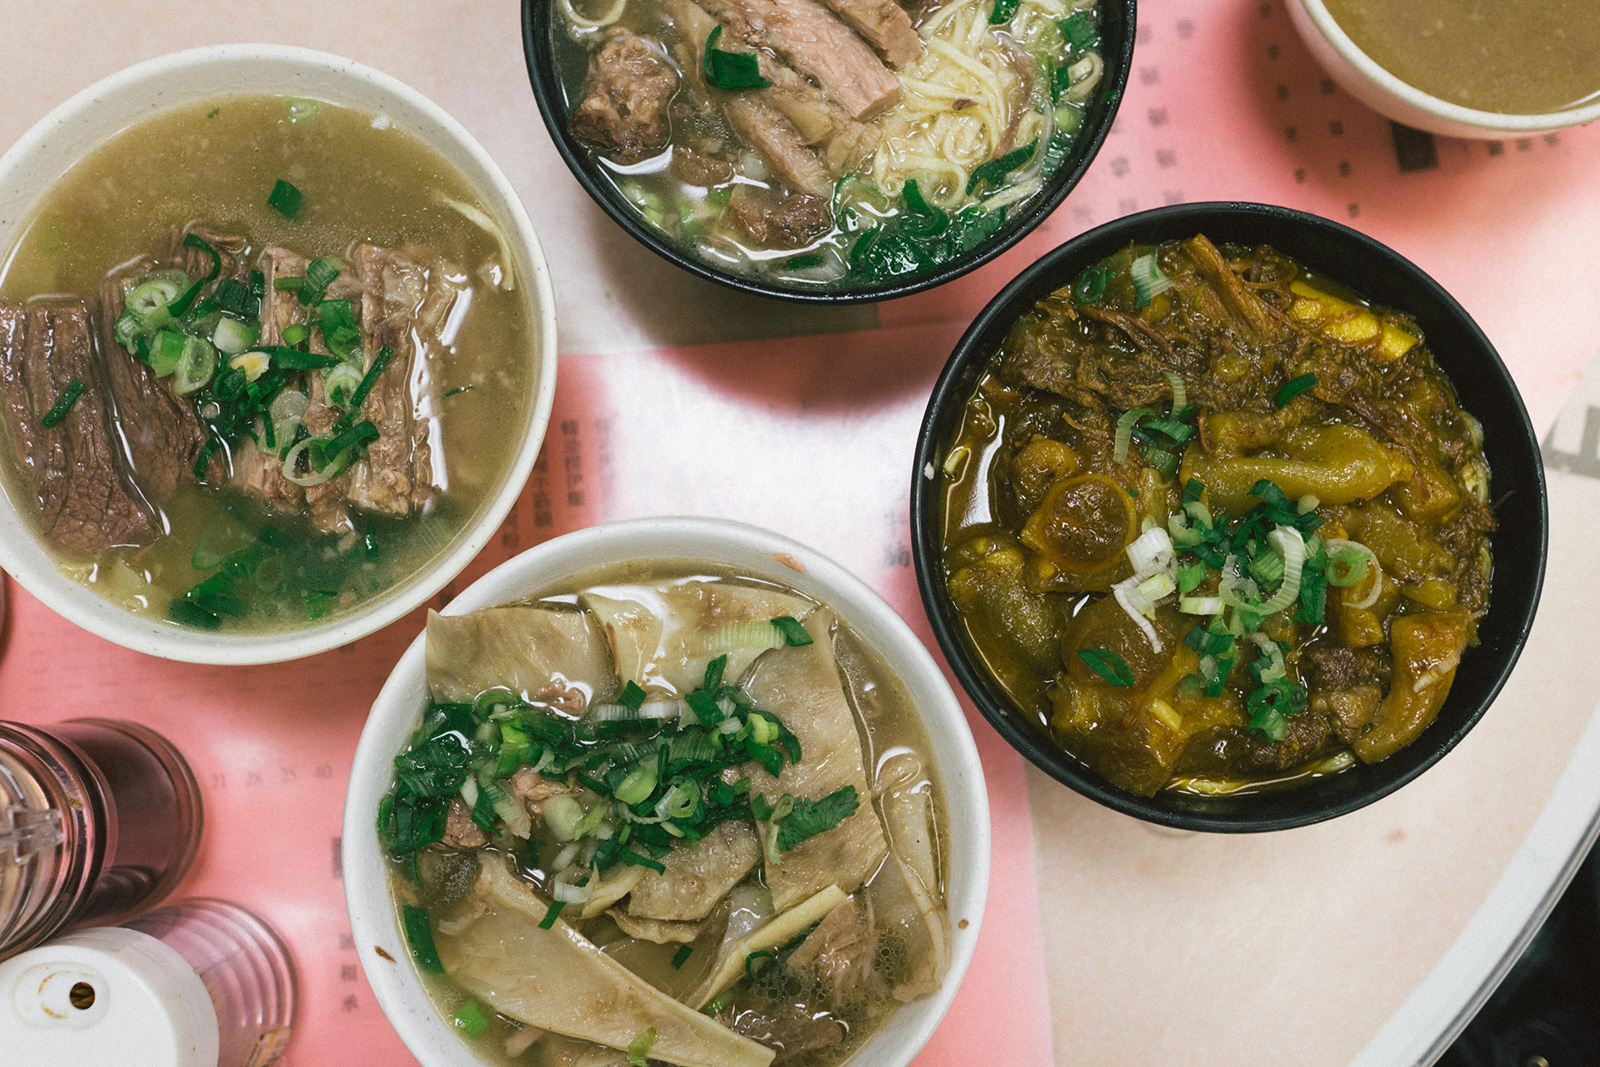 Remarkable That Restaurant Cray Where To Eat In Hong Kong Beutiful Home Inspiration Semekurdistantinfo